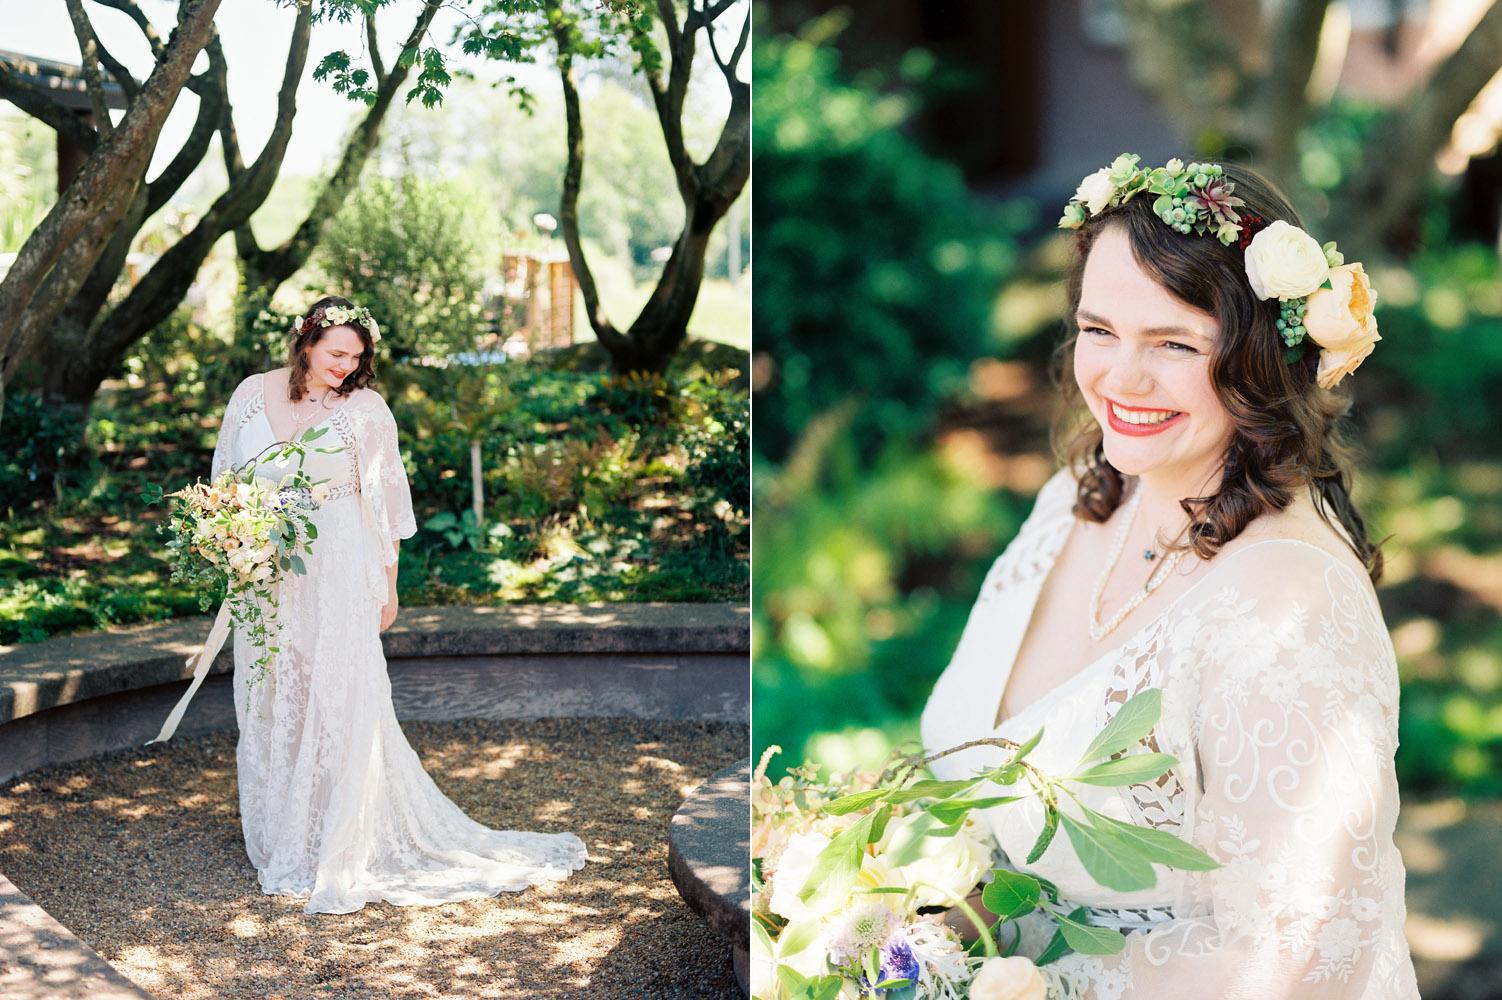 Rue de Seine Wedding Dress at a University of Washington Seattle wedding